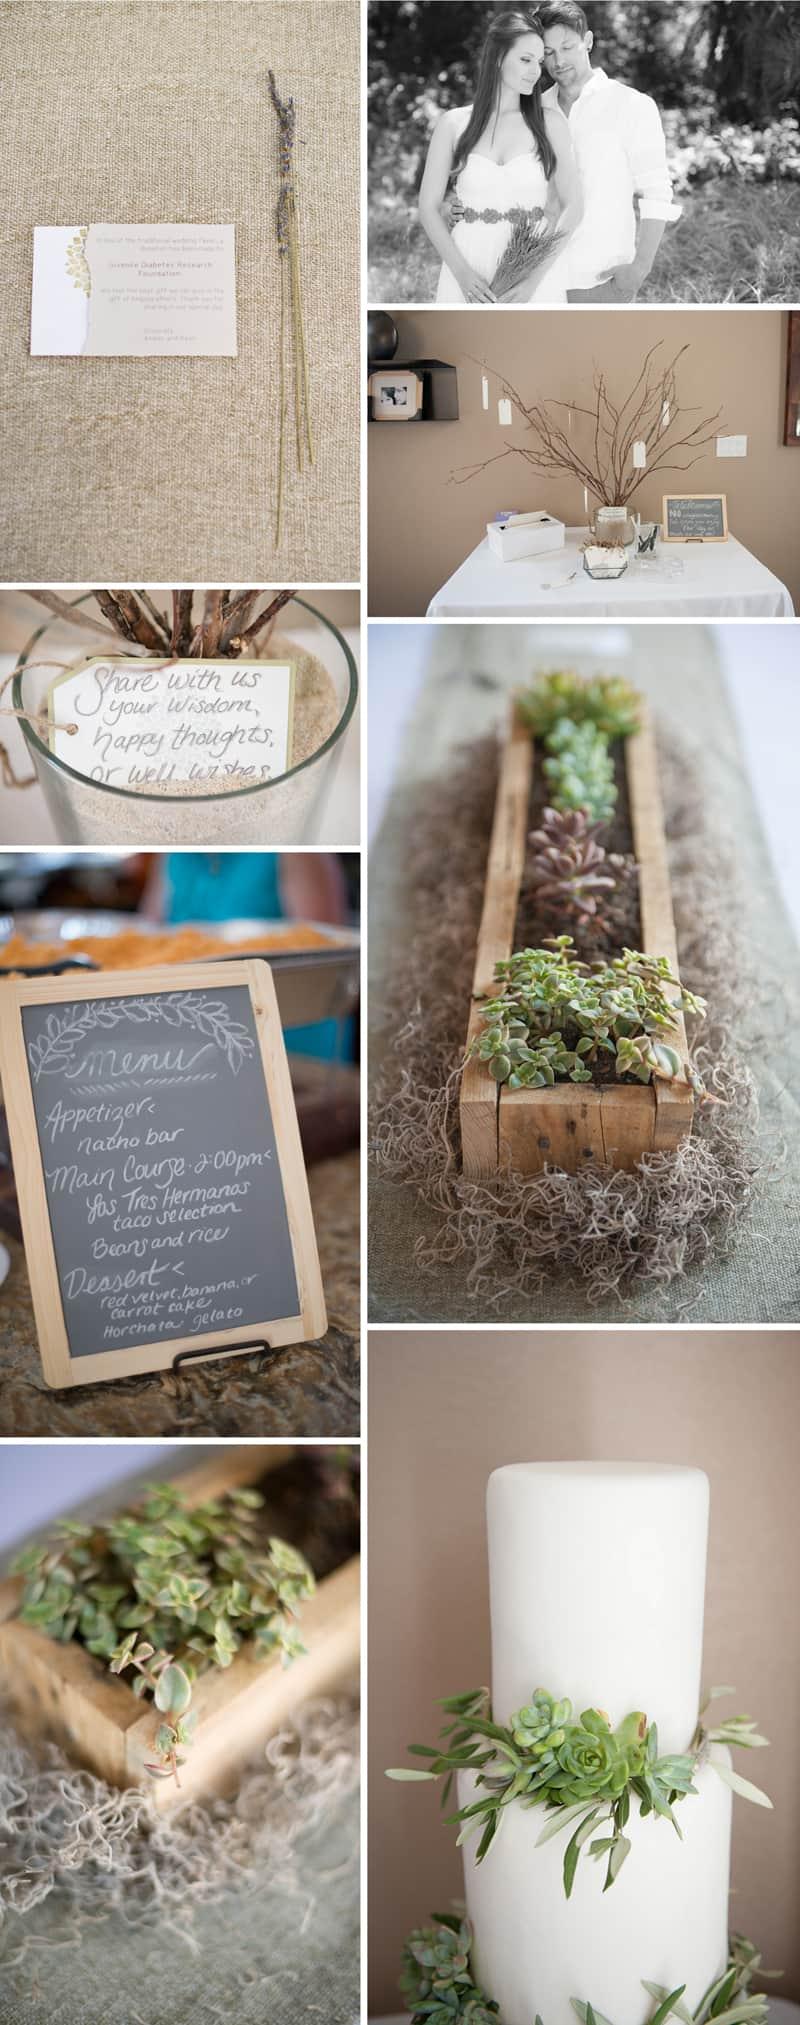 An Intimate Rustic Beach Wedding 5